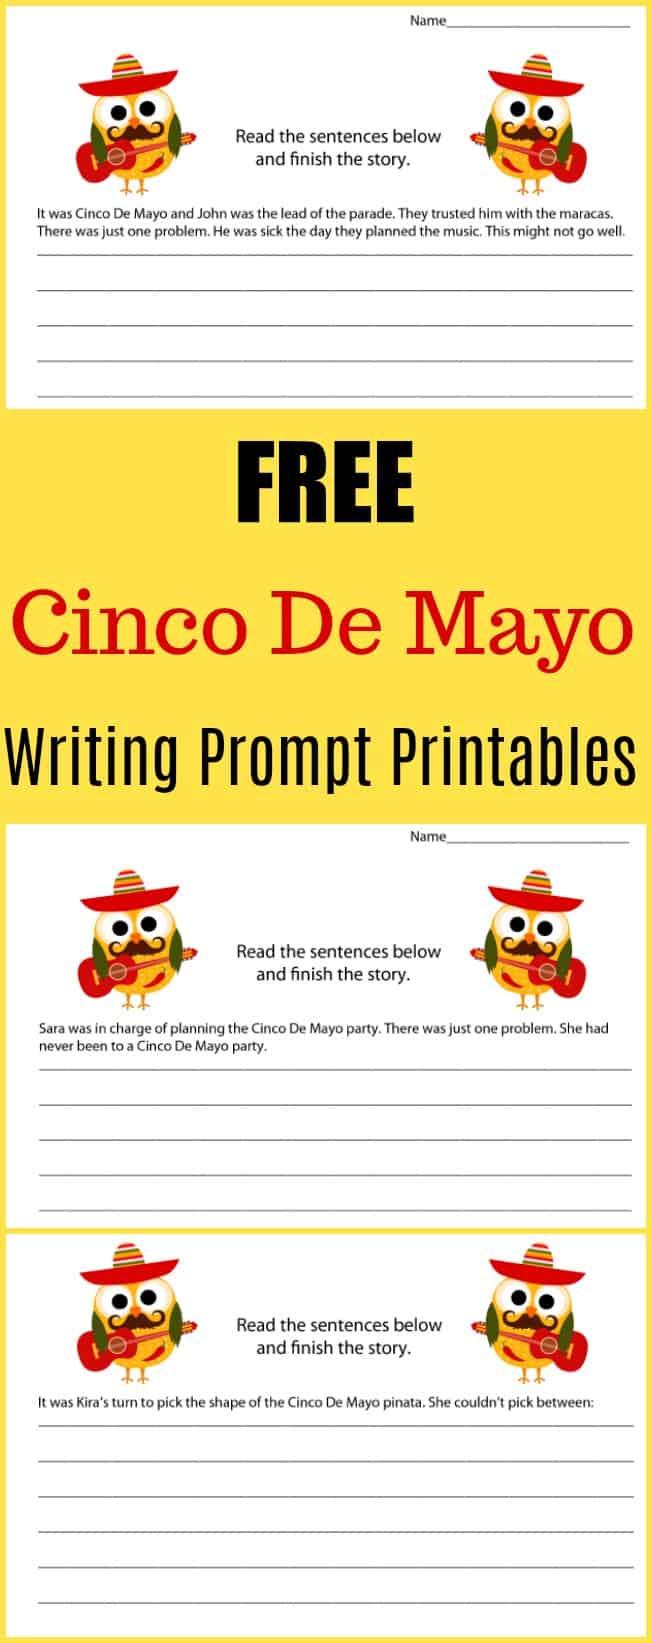 Free Cinco De Mayo Writing Prompt Printables